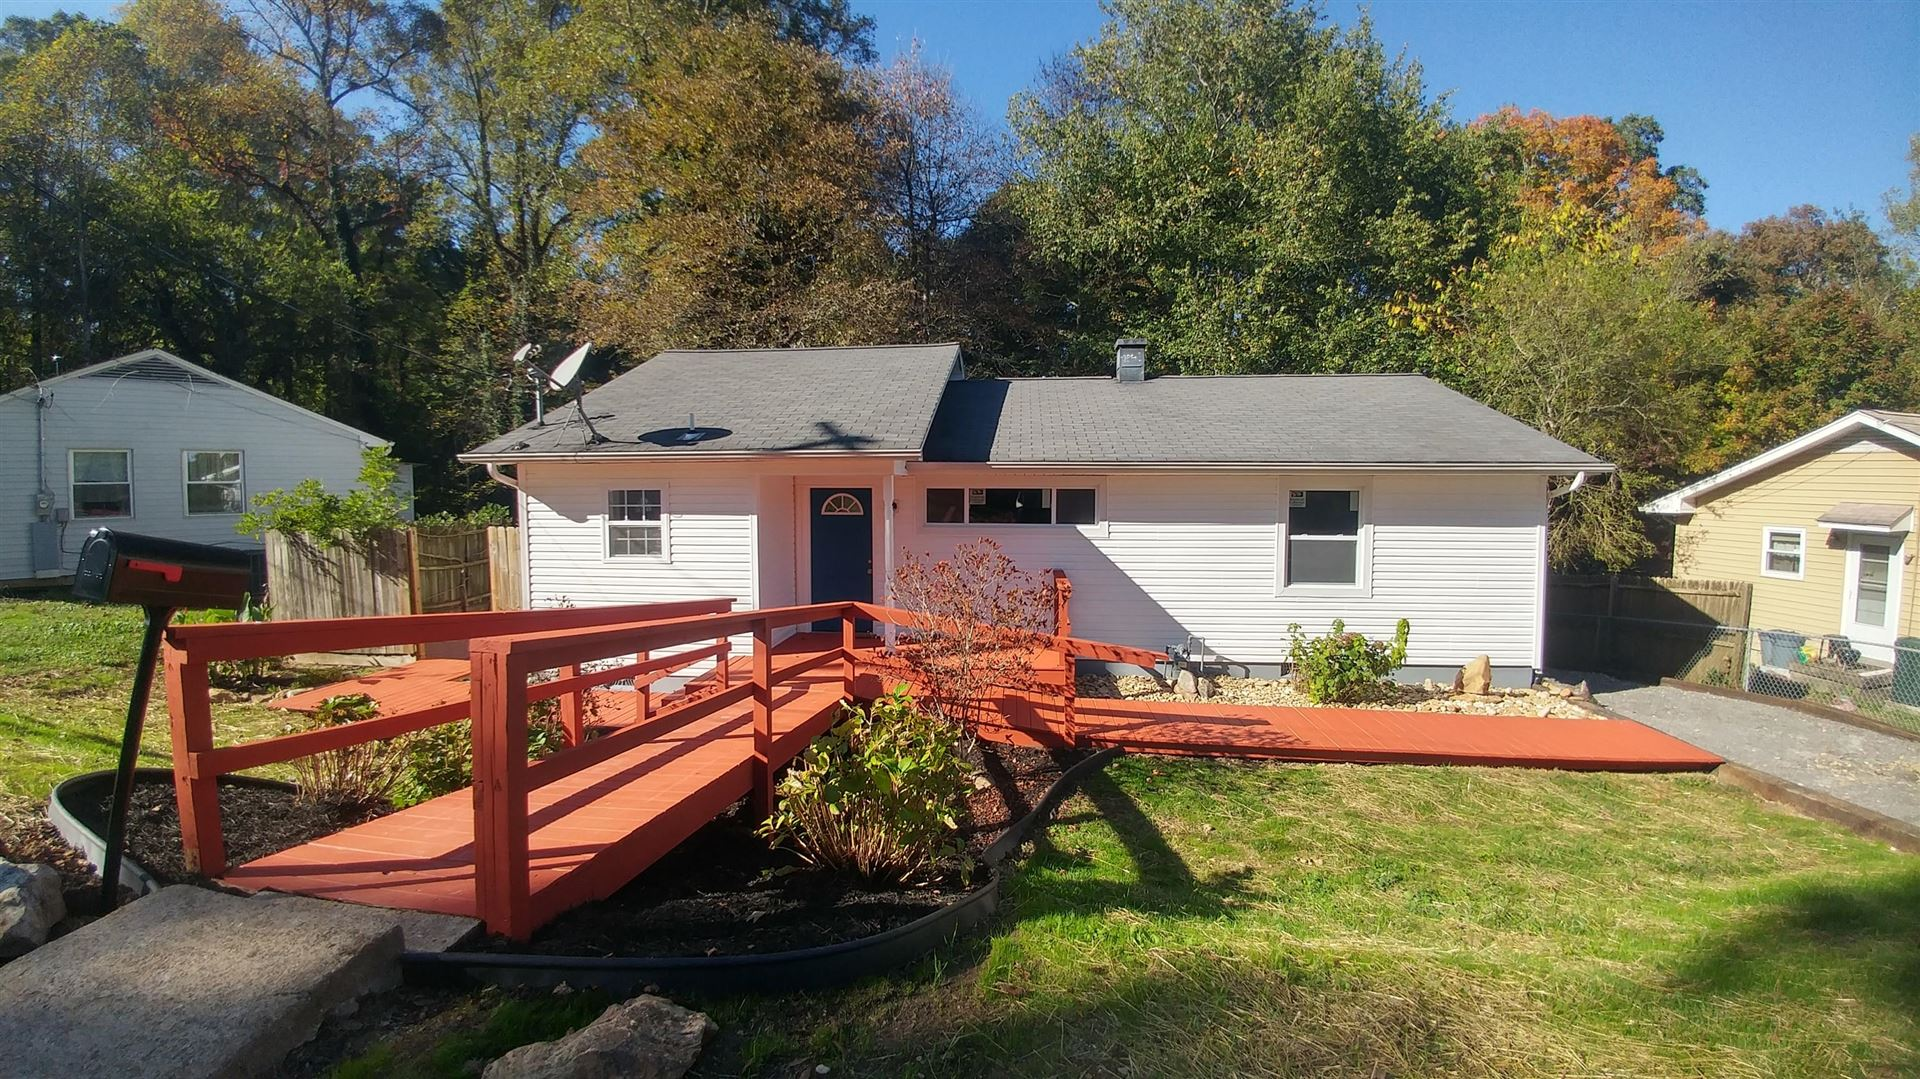 Photo of 110 Andover Circle, Oak Ridge, TN 37830 (MLS # 1132906)